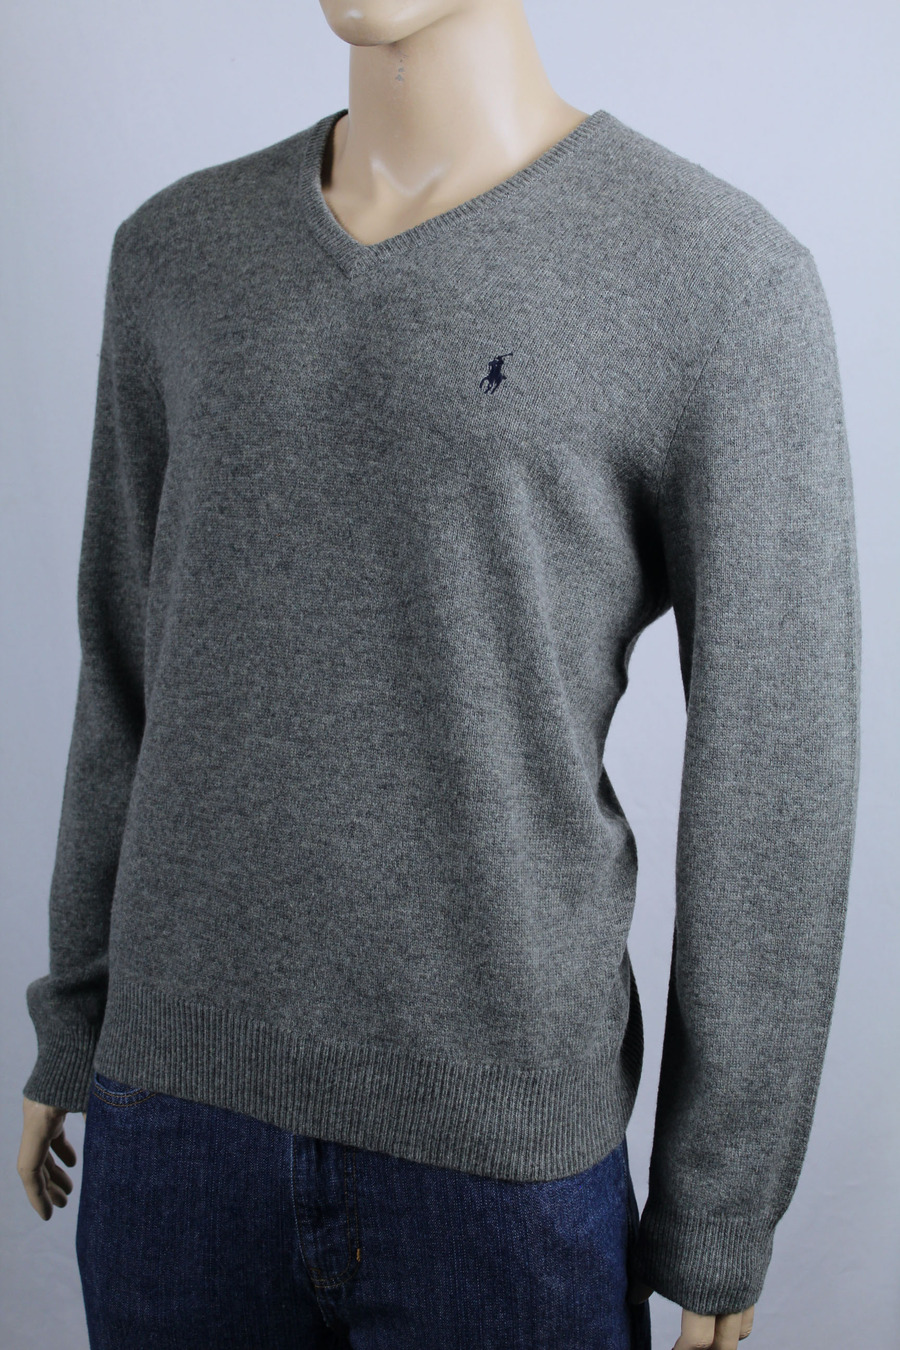 Polo Ralph Lauren Navy Blue Crewneck Sweater Green Pony NWT